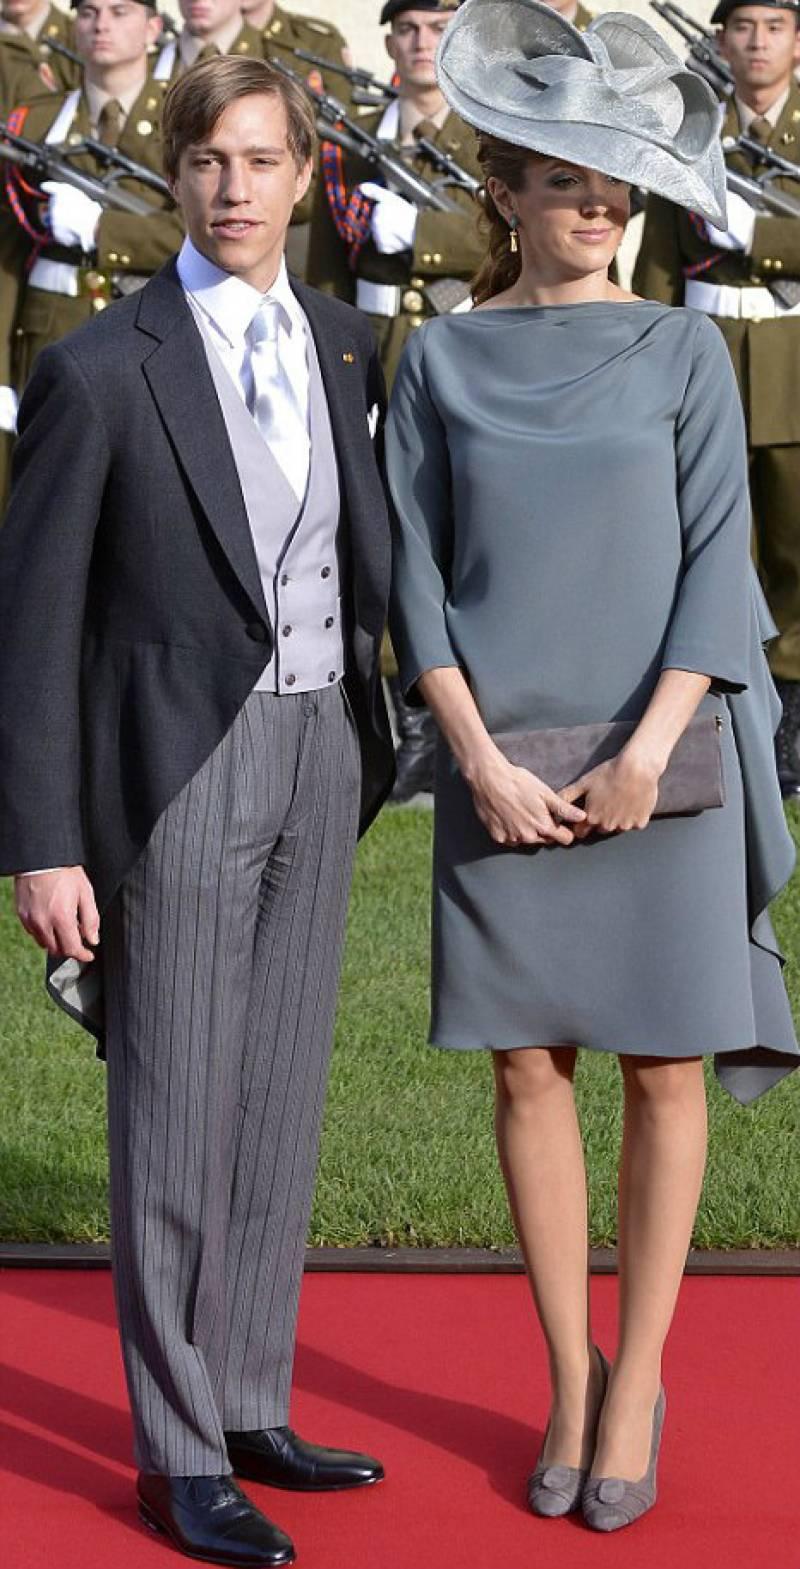 Princess Tessy divorces husband Prince Louis